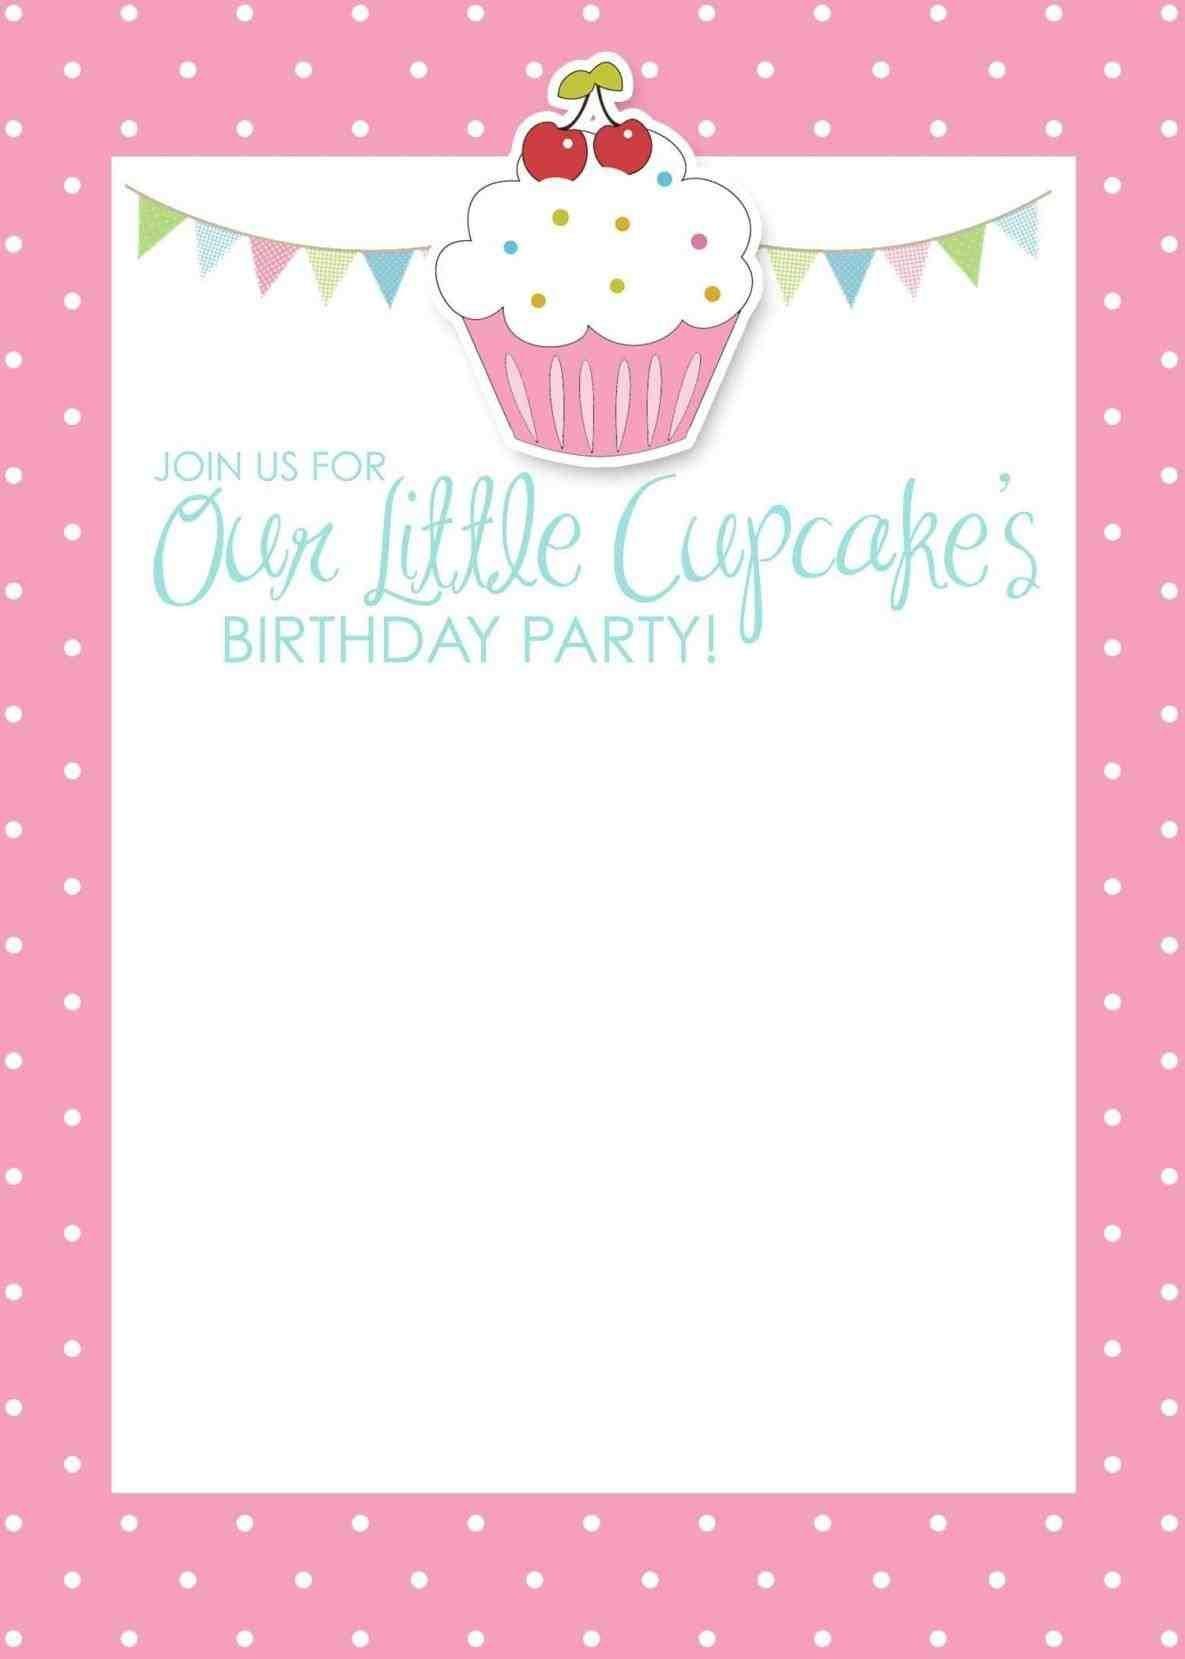 Bbq Birthday Party Invitation Wording. Dog Themed Birthday Party - Dog Birthday Invitations Free Printable